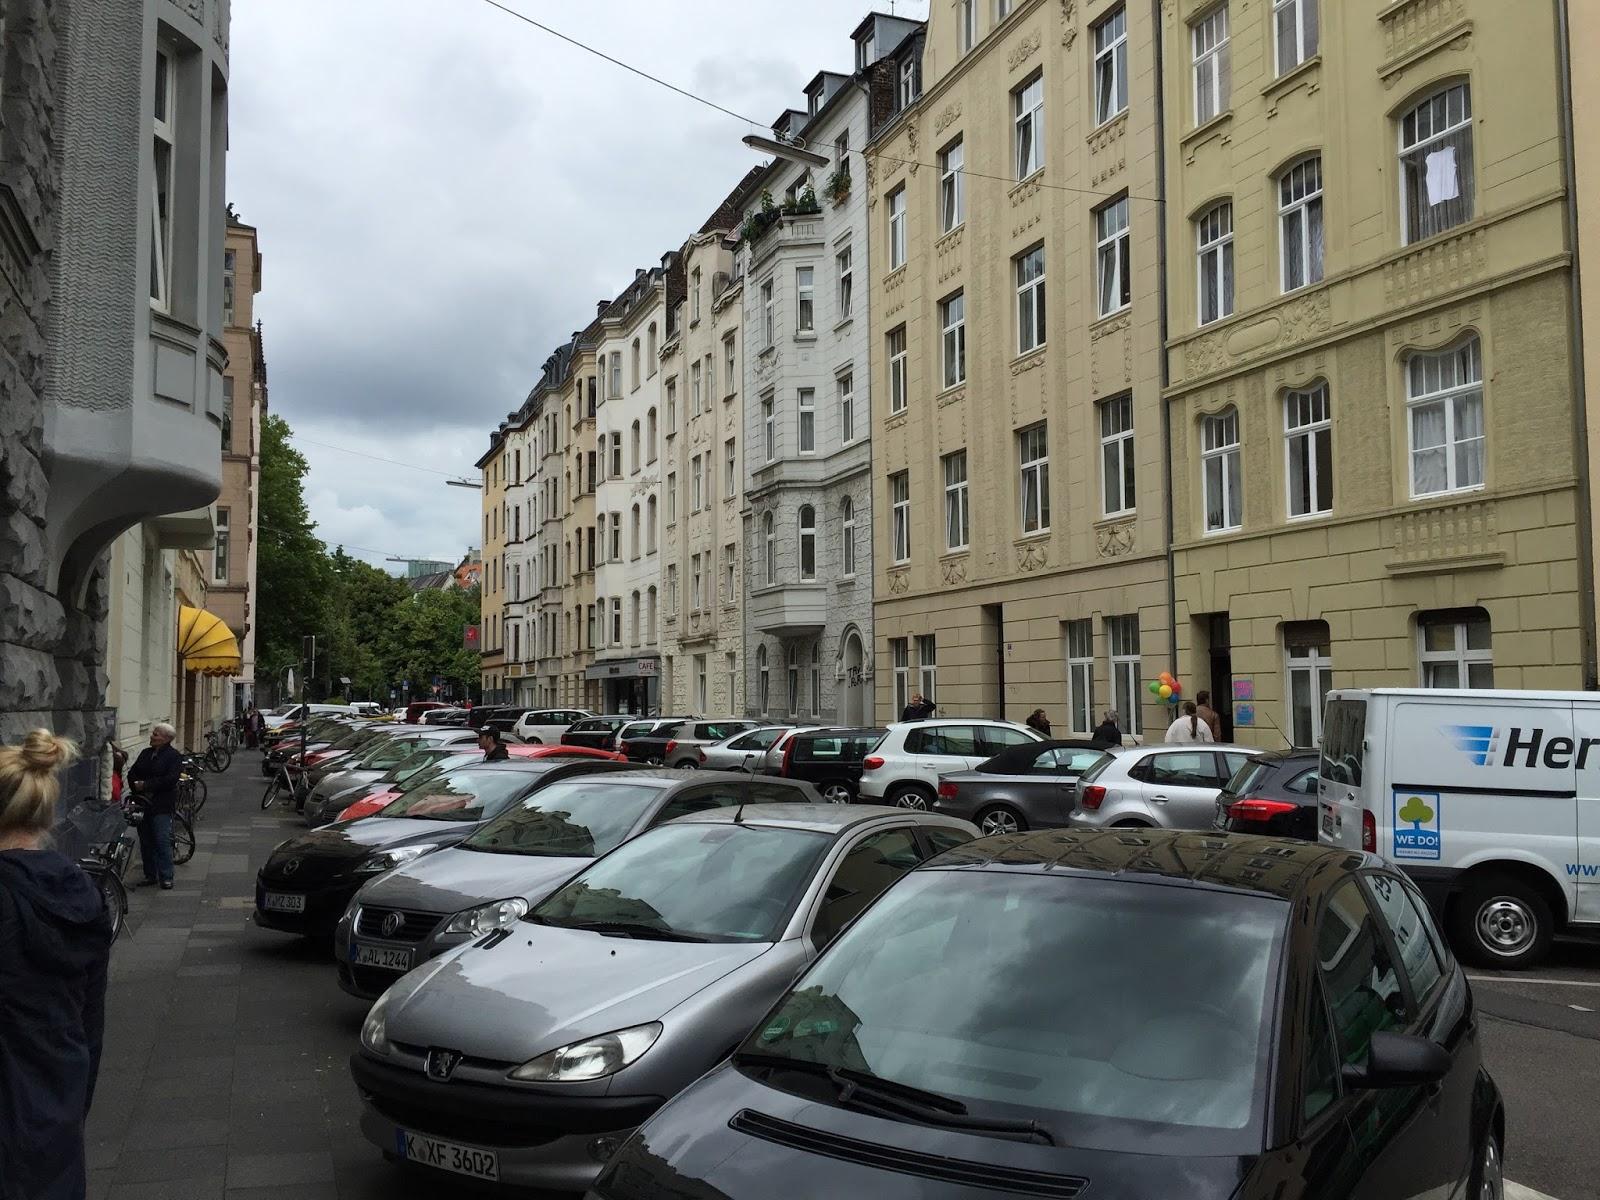 Hofflohmarkt Koln Agnesviertel